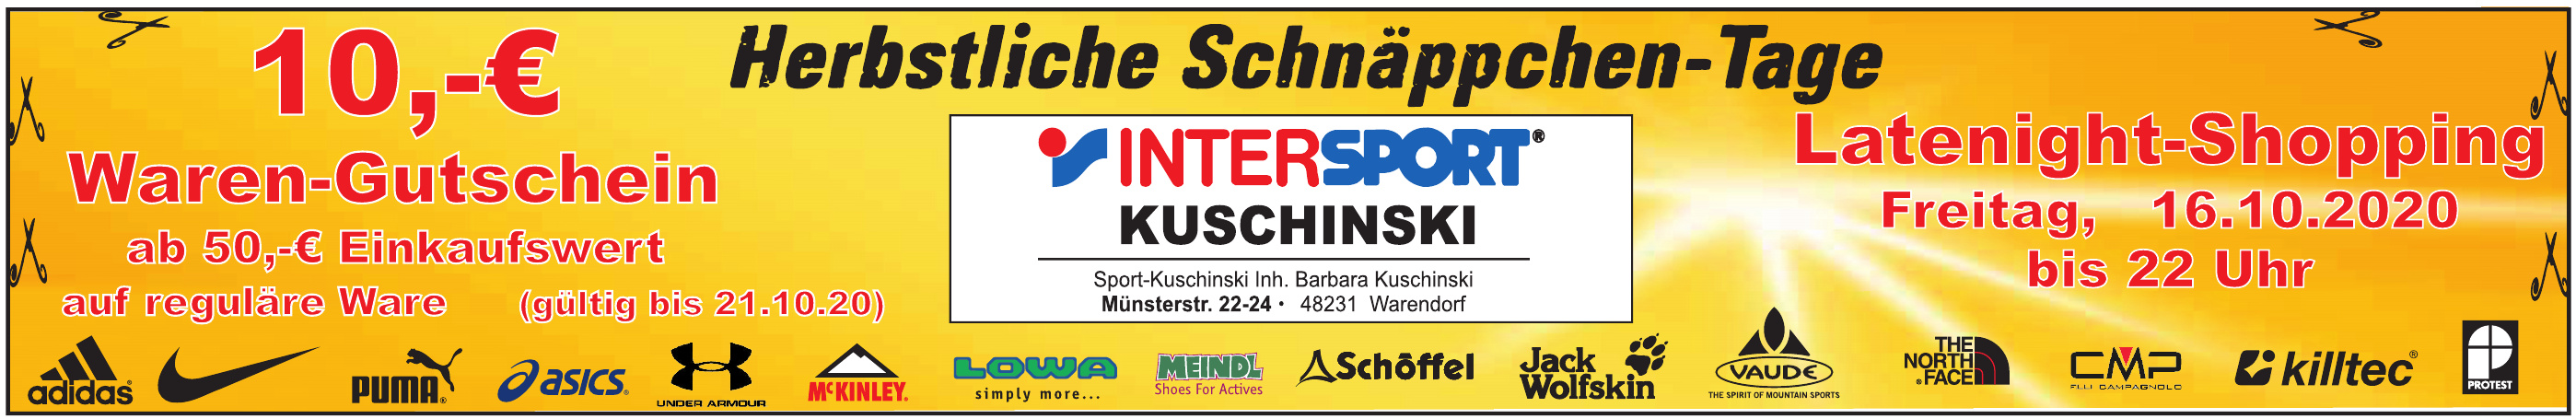 Intersport Kuschinski